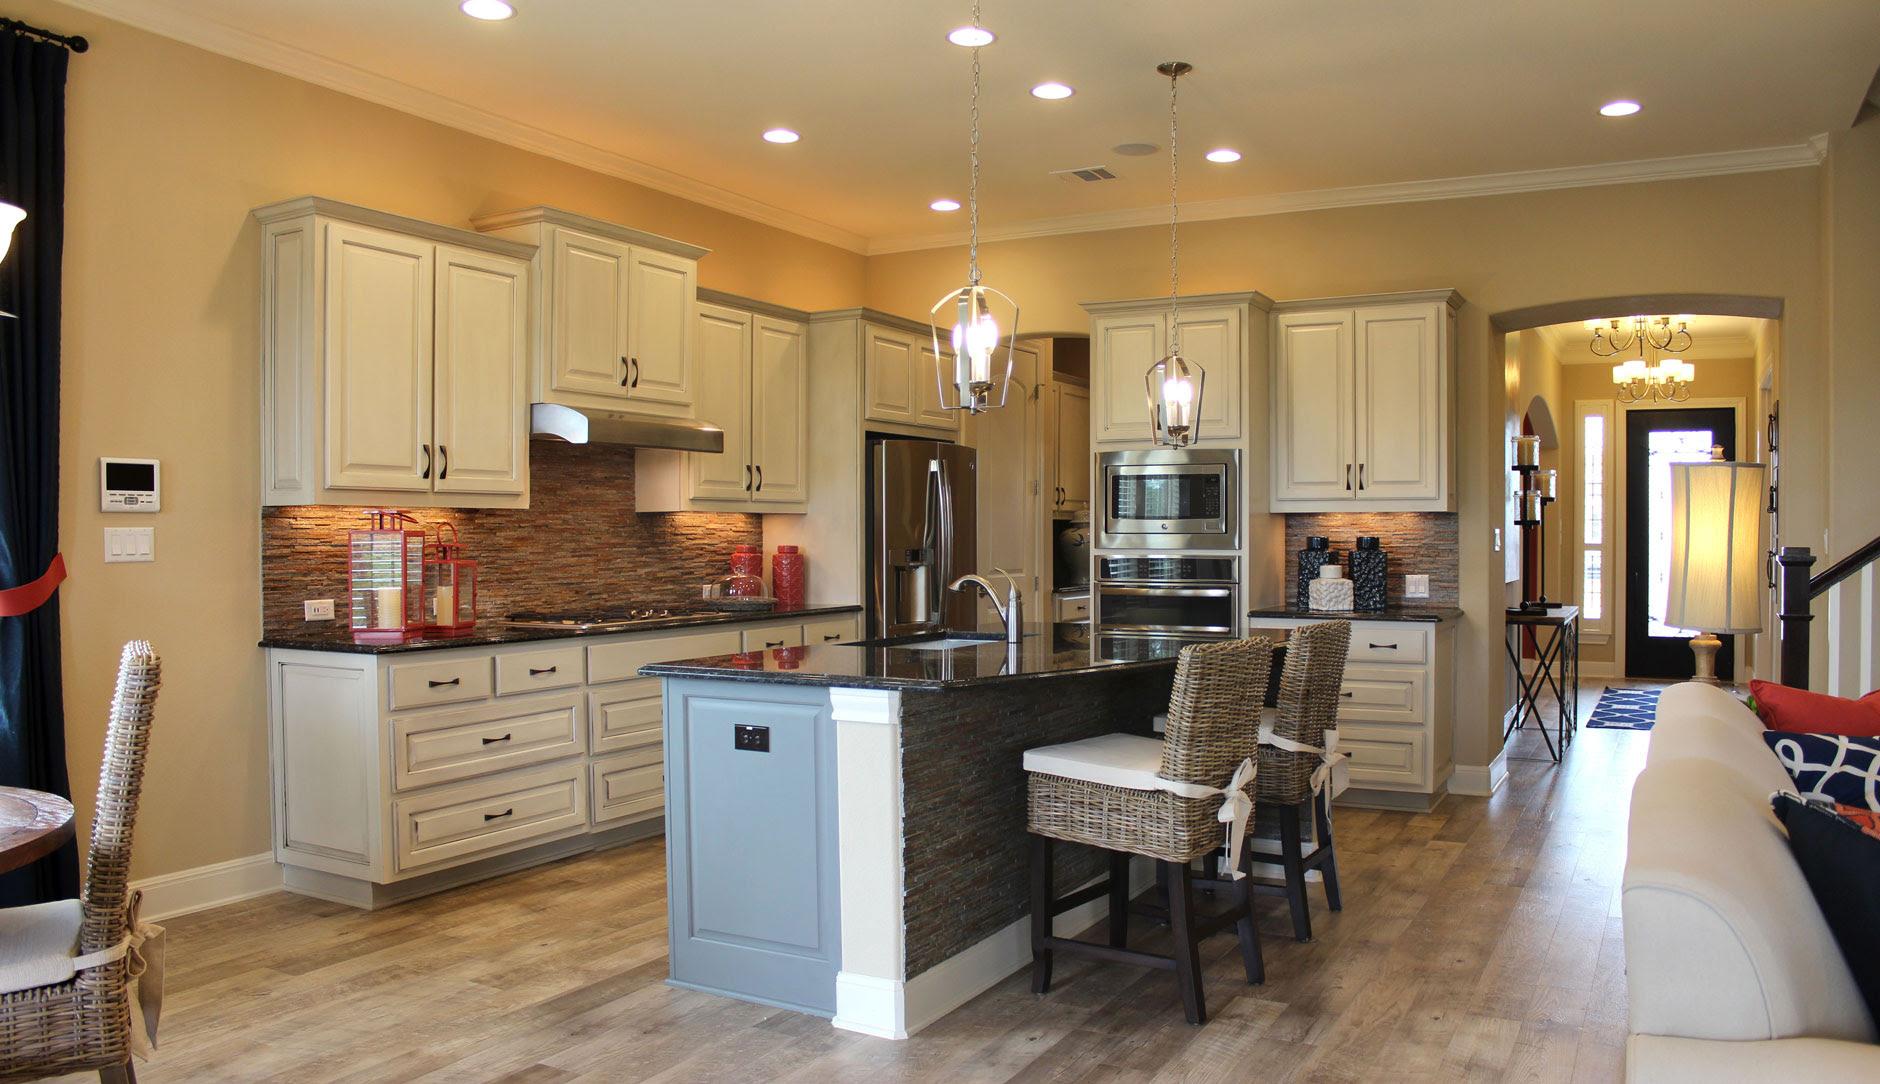 Kitchen Photos – Burrows Cabinets – central Texas builder ...